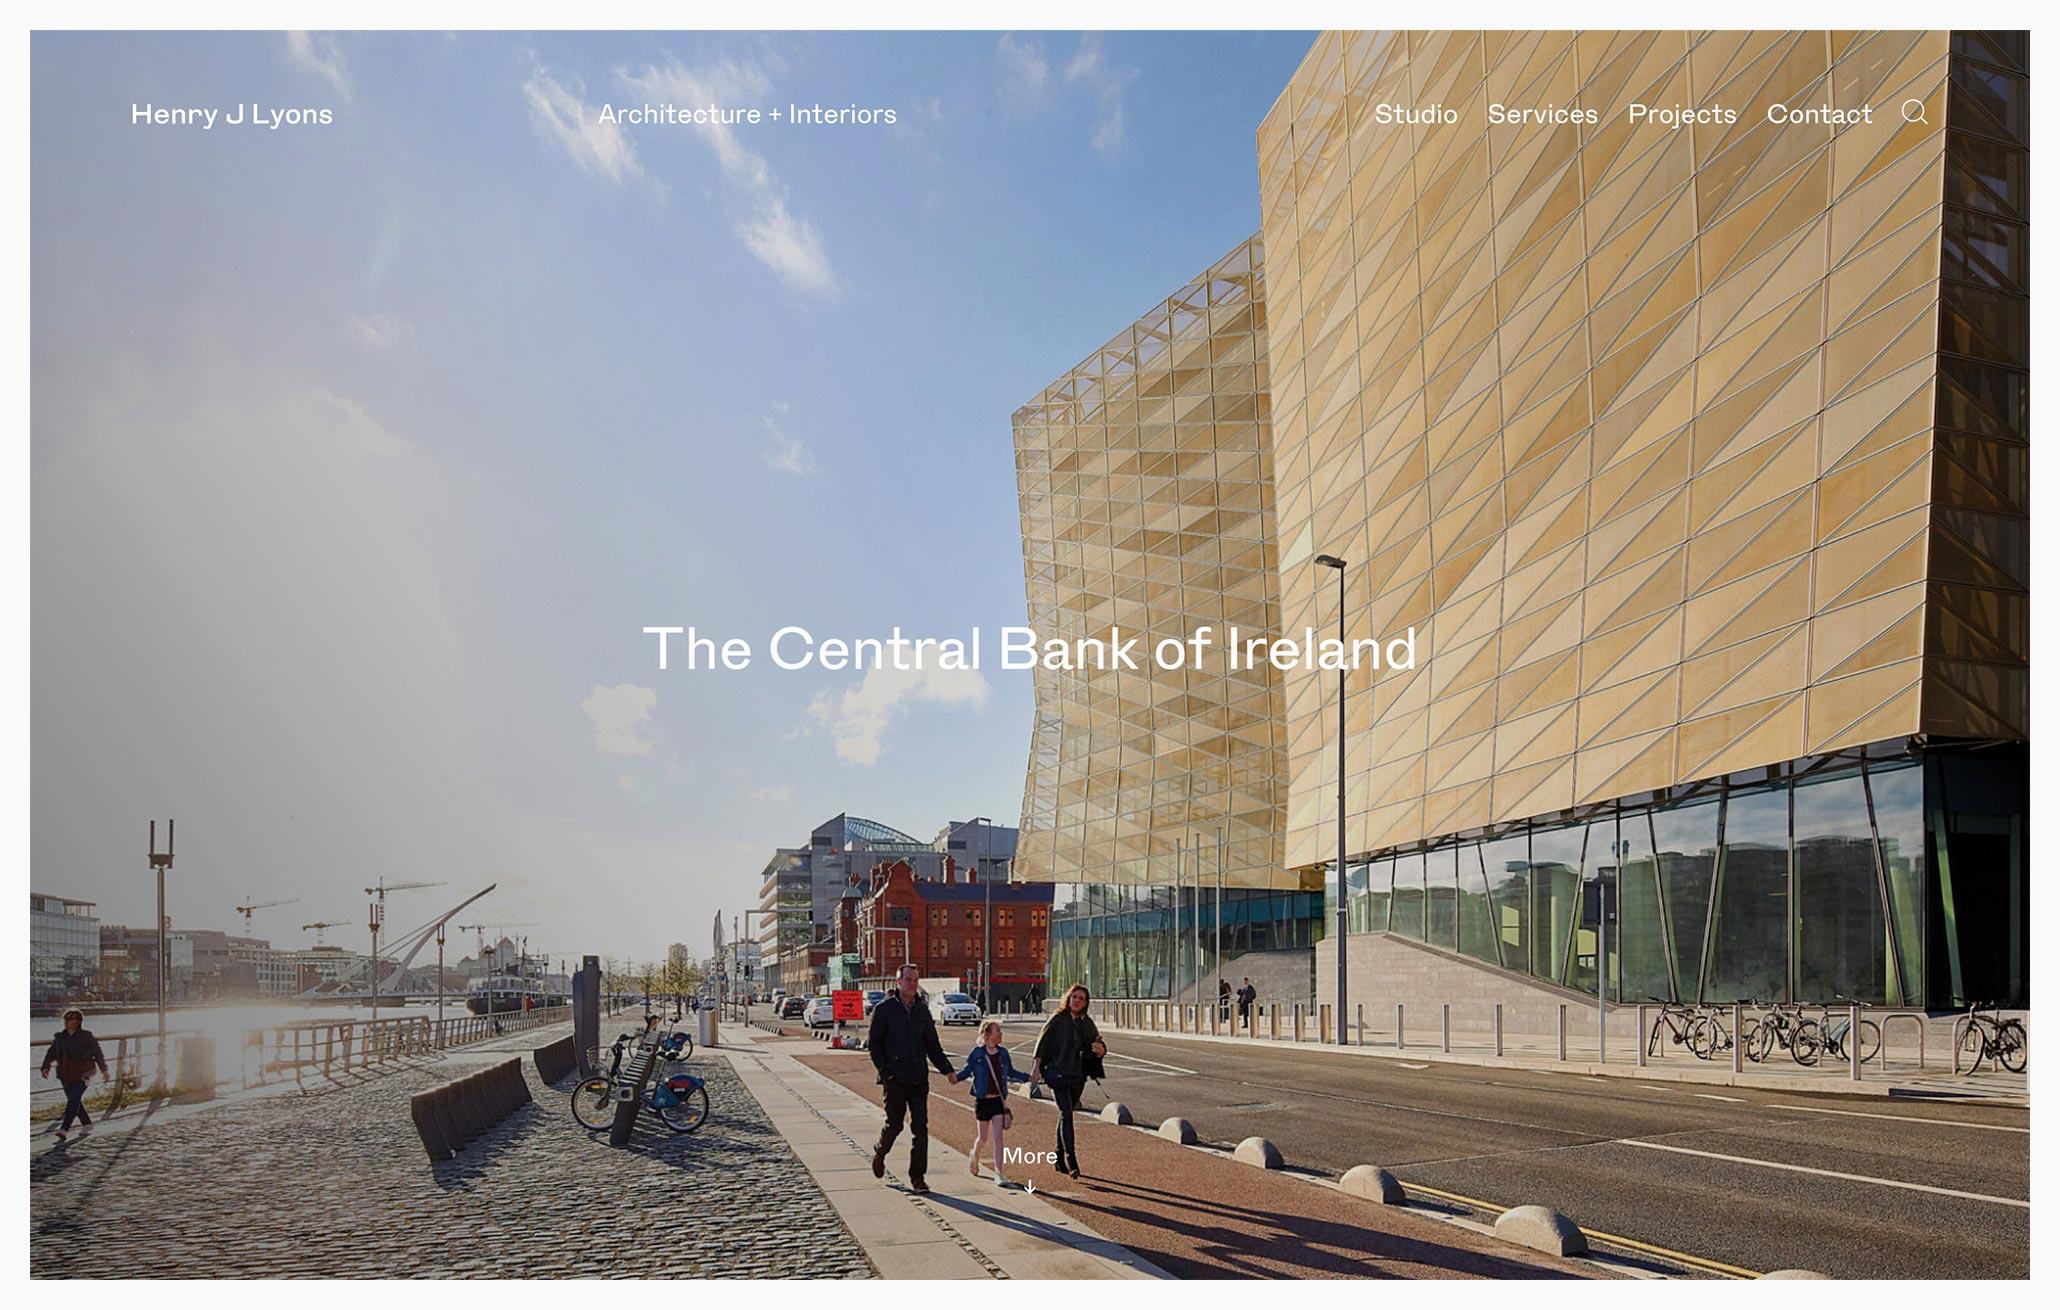 Henry J Lyons - Best Architecture Website of 2019